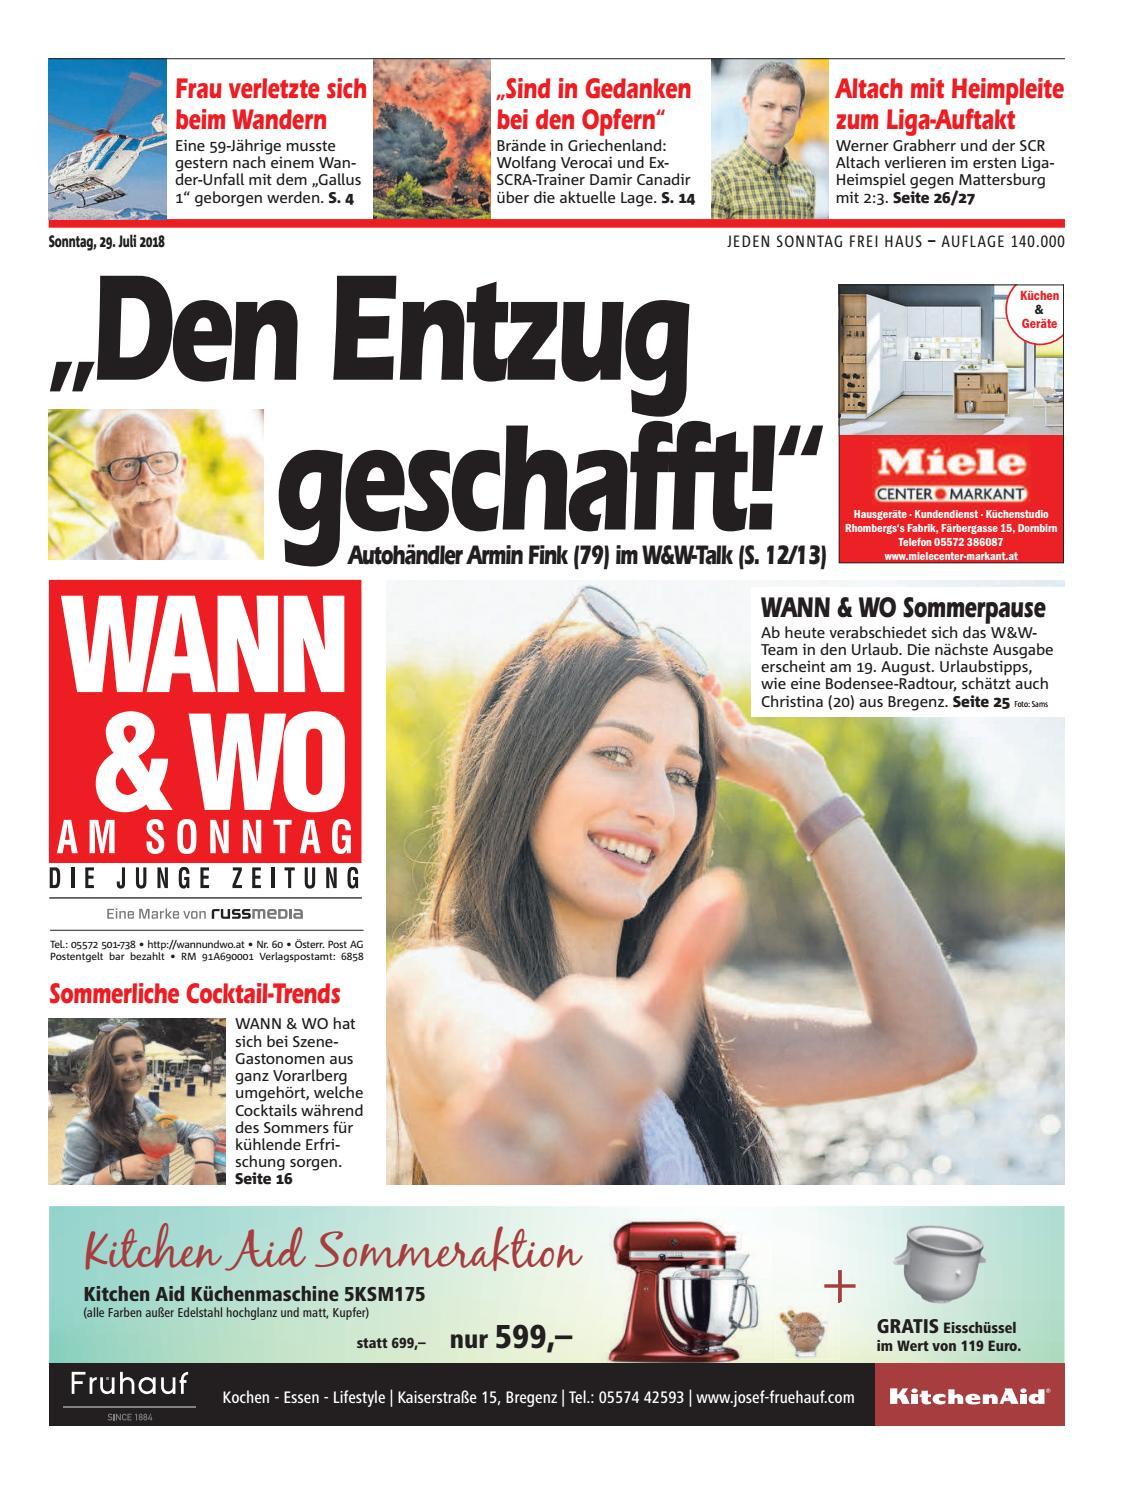 Eferding Expat Singles Altach - Swiss Dating Mauthausen